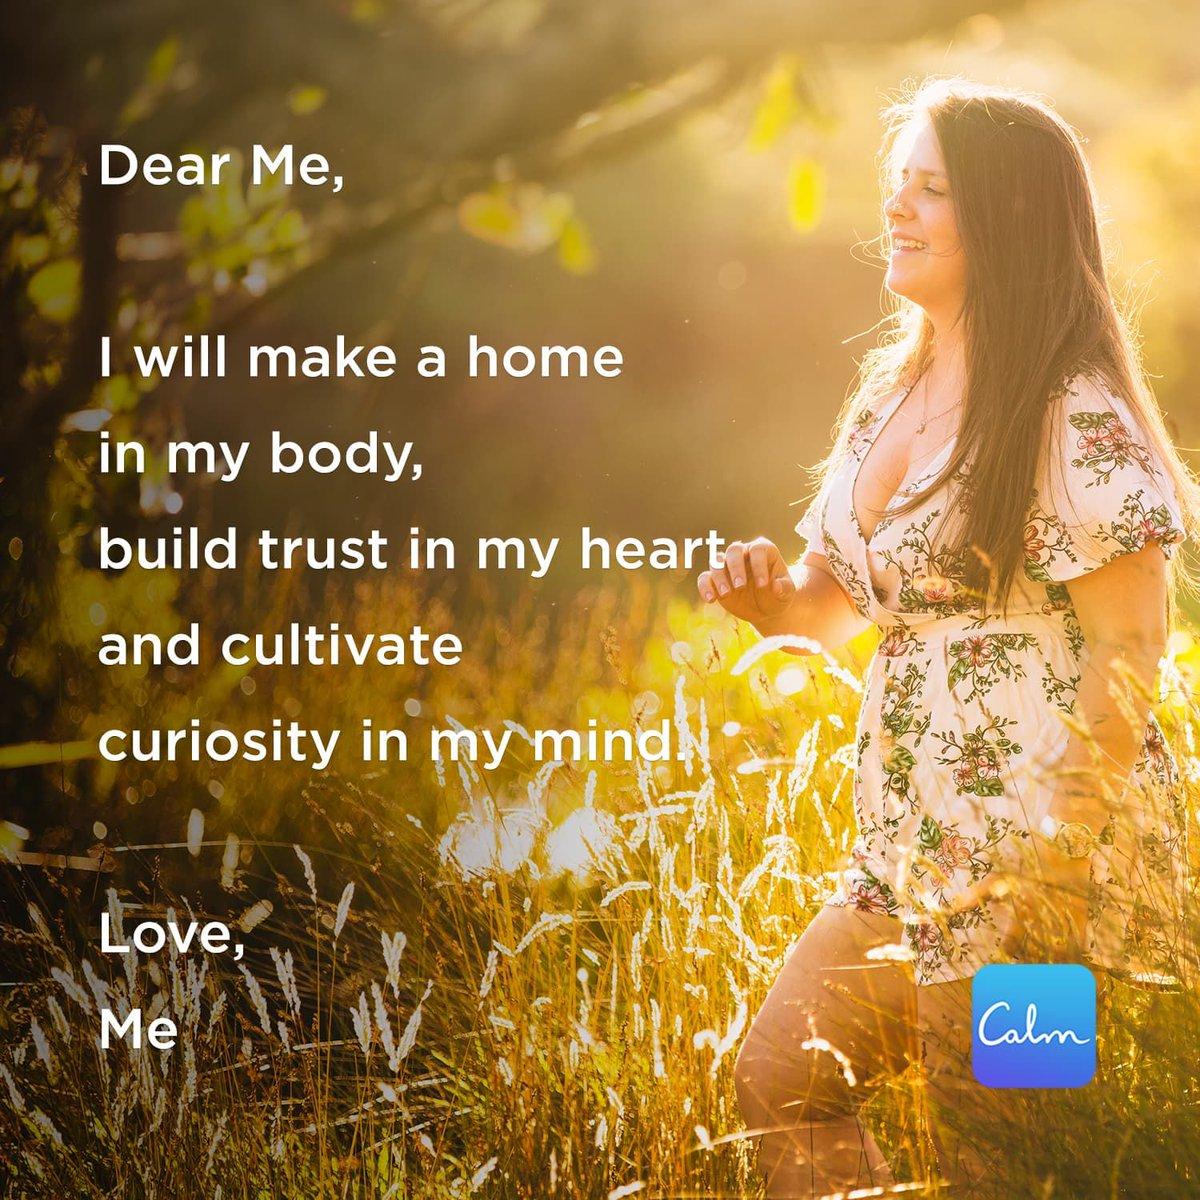 Dear Me